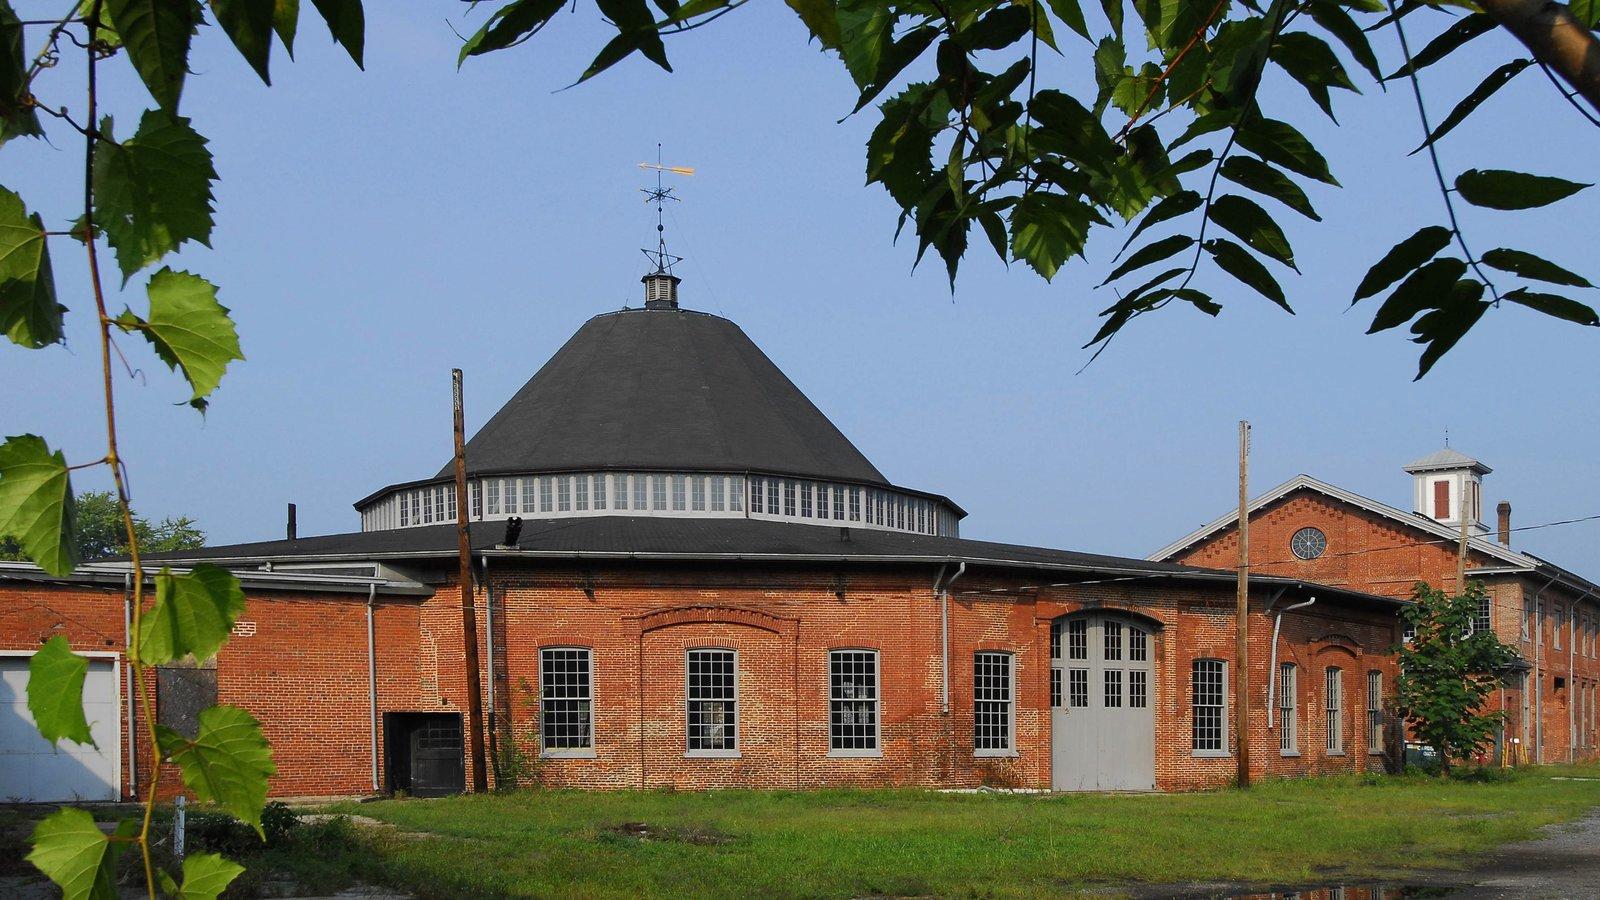 Martinsburg mostrando patrimonio de arquitectura